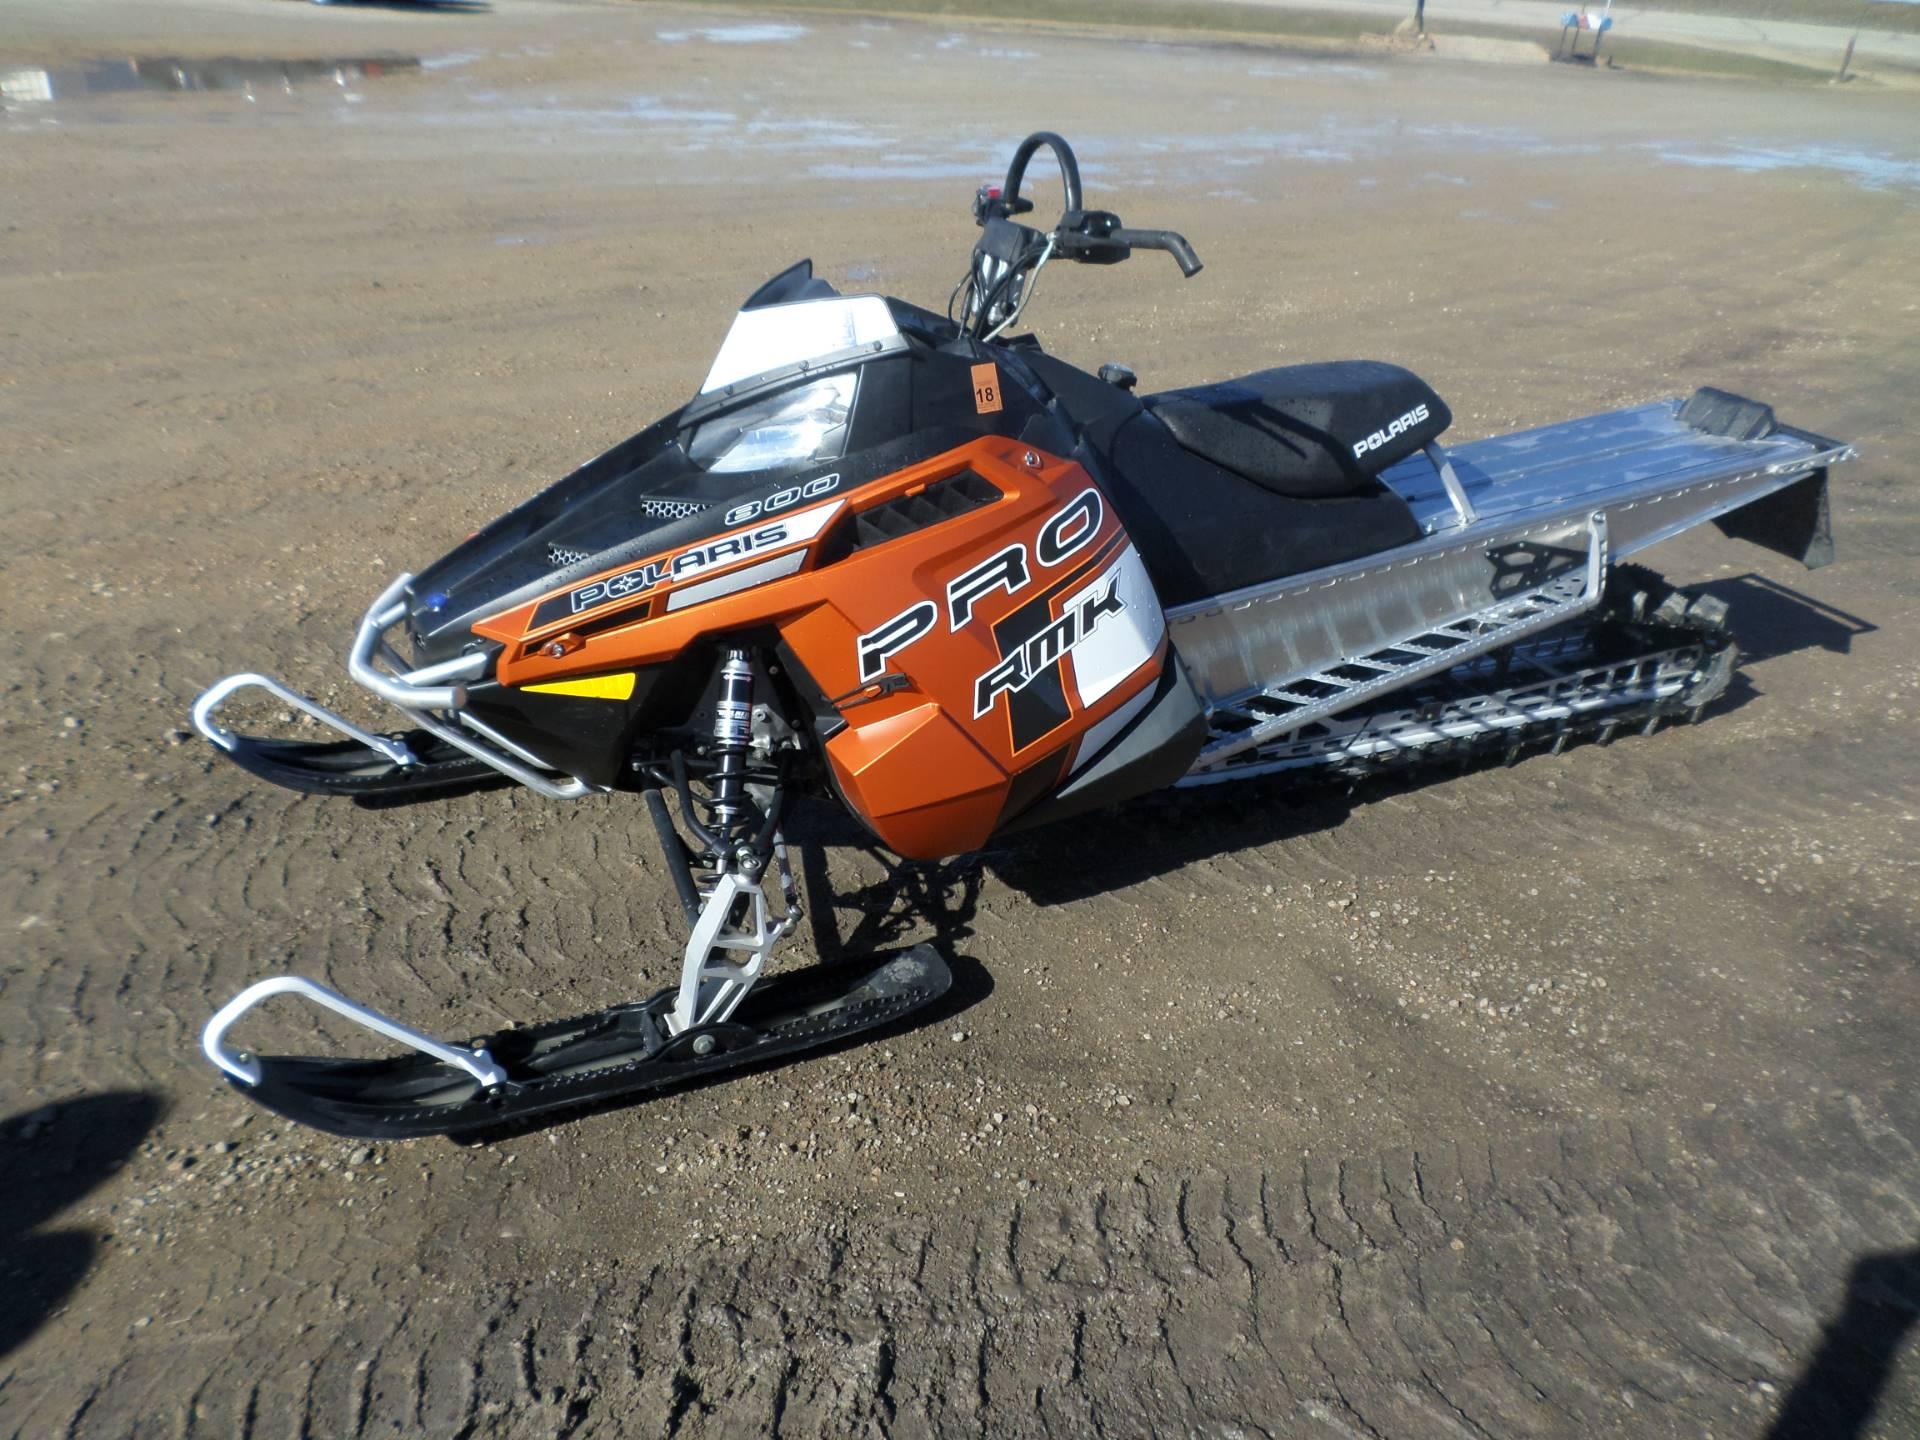 2013 Polaris 800 RMK 155 for sale 5097